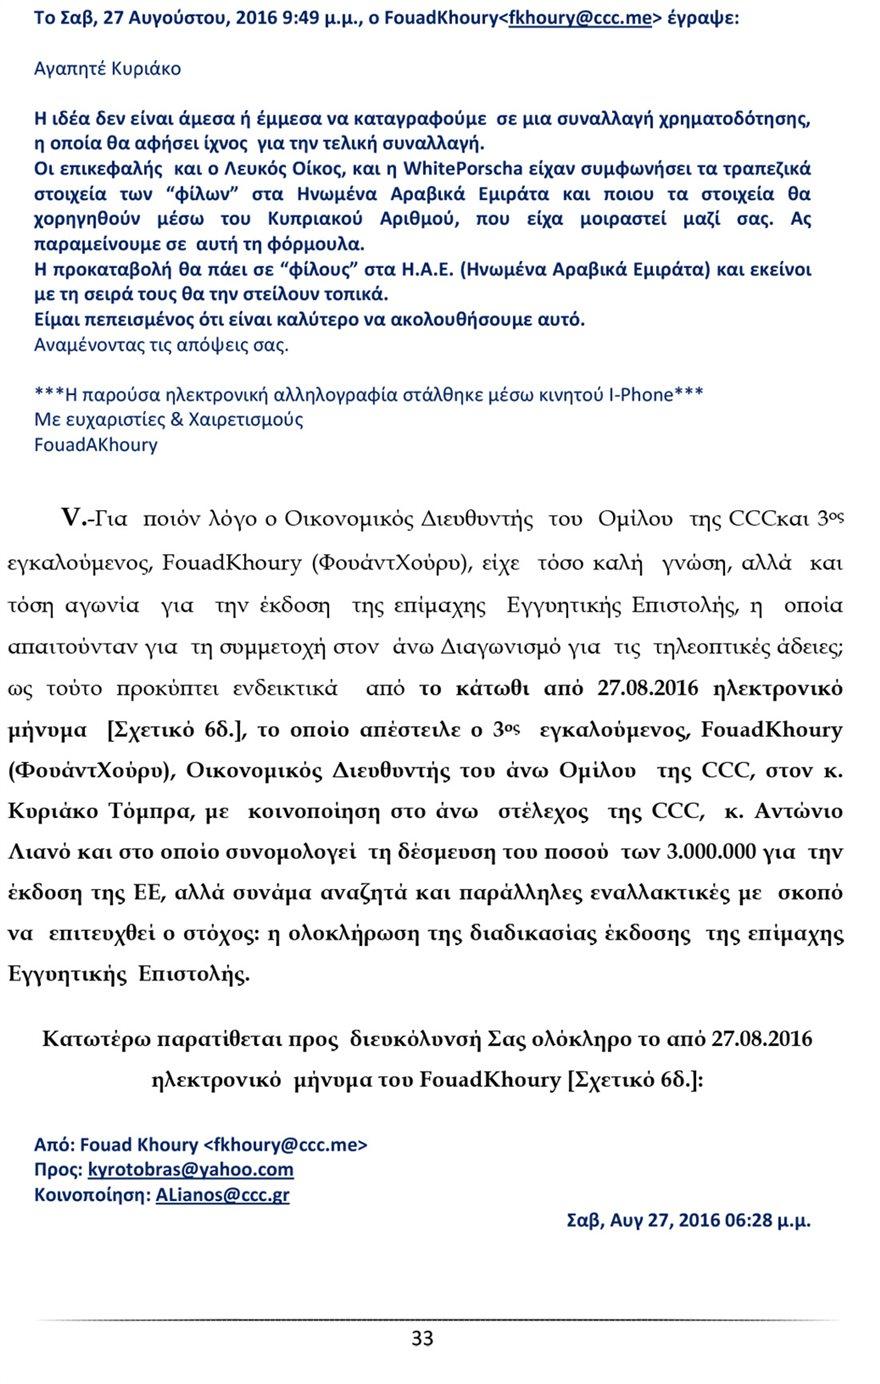 ypomnima-33